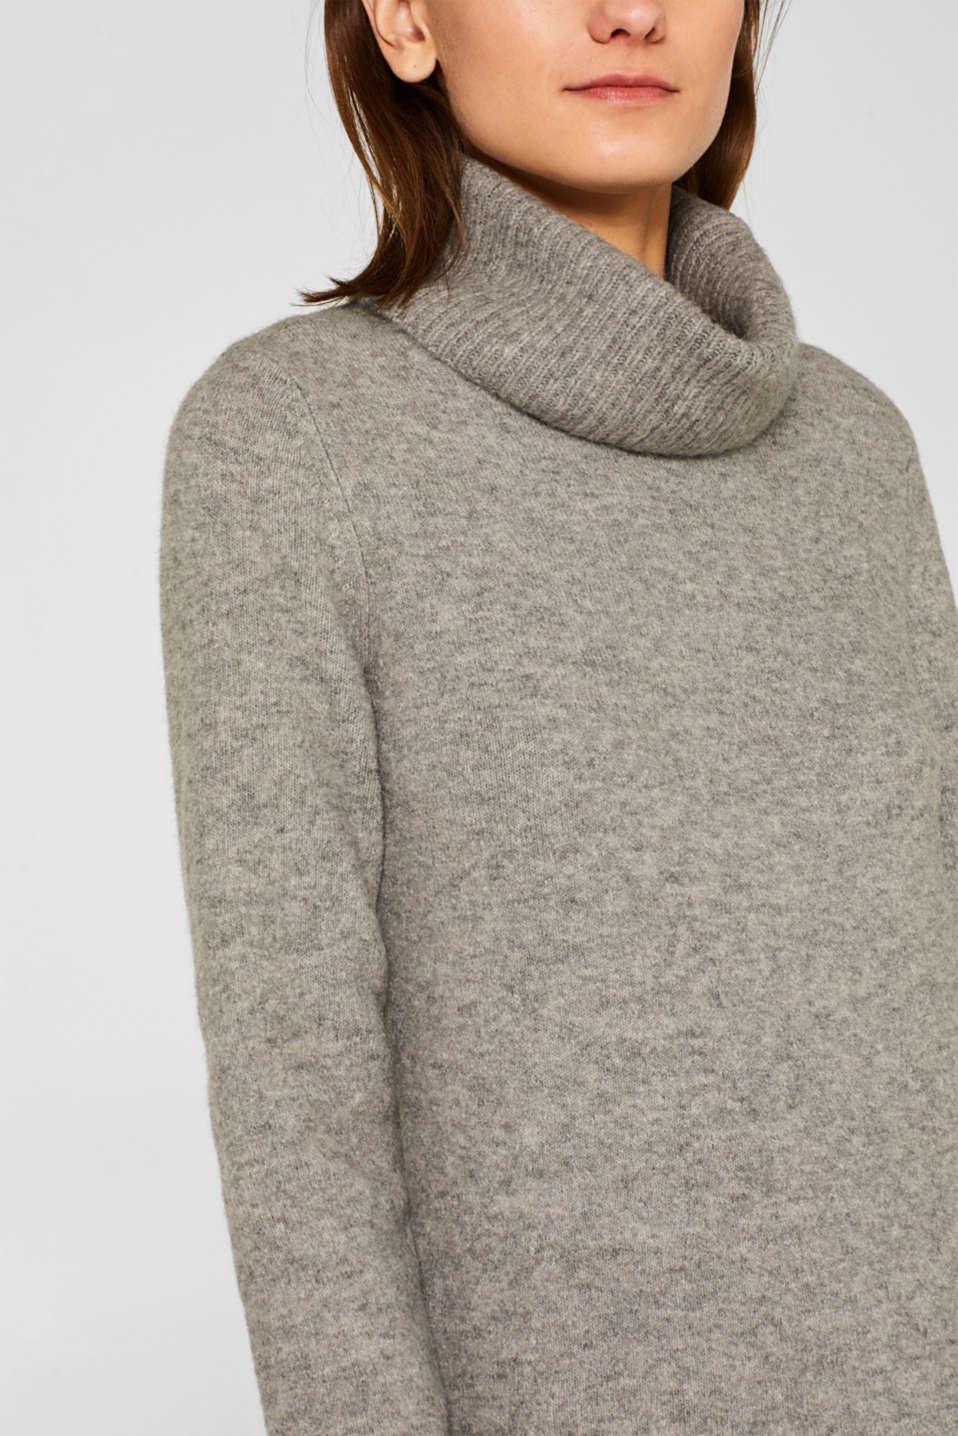 Dresses flat knitted, MEDIUM GREY 5, detail image number 3